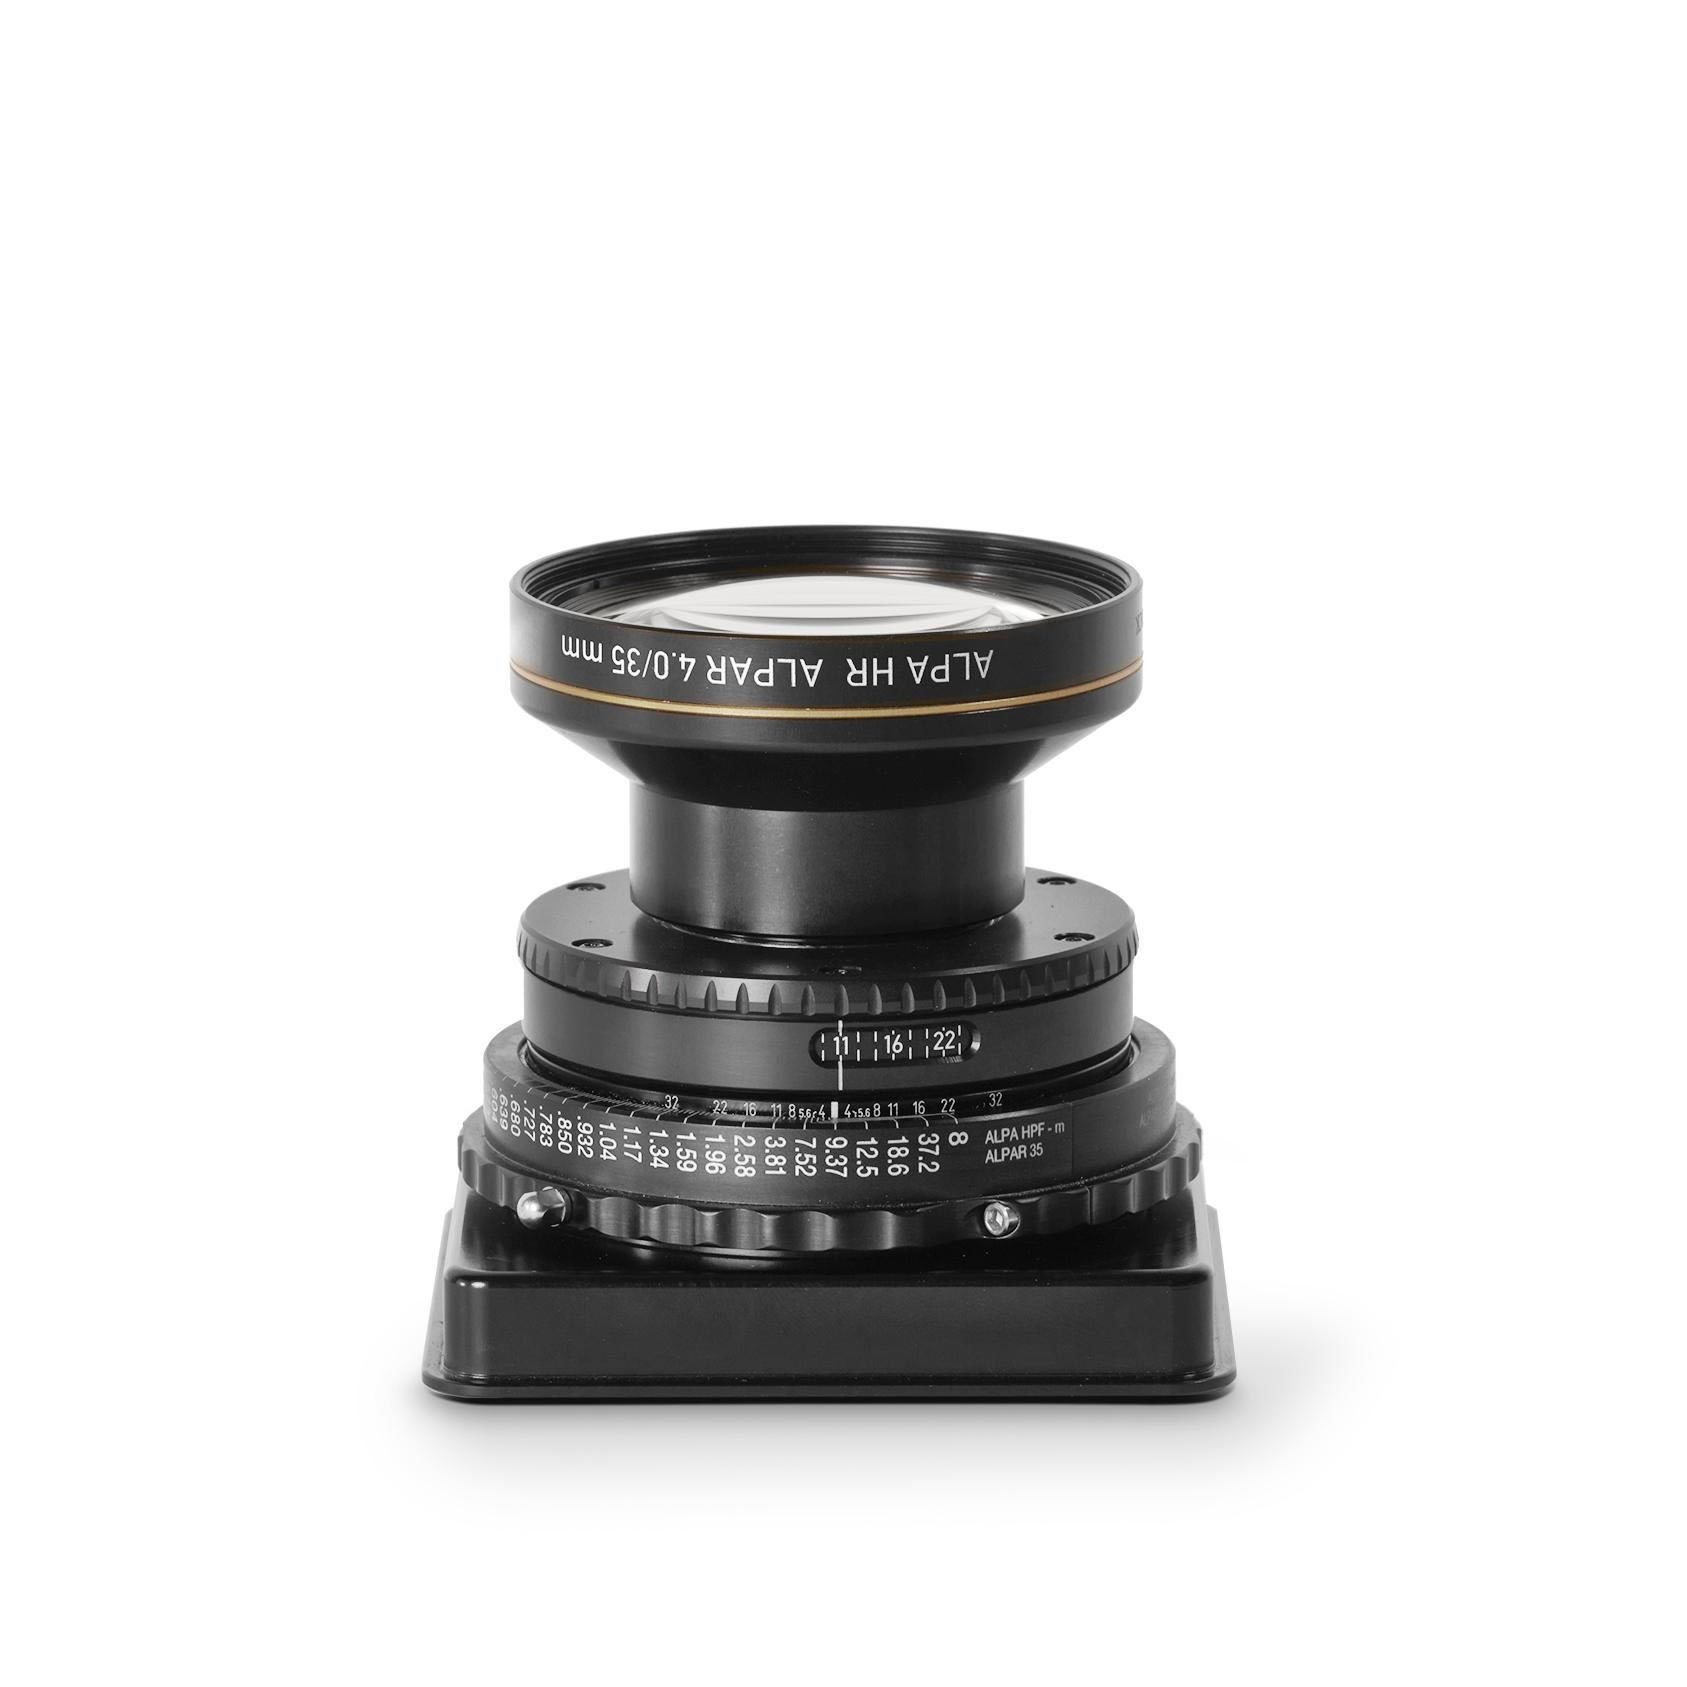 Rodenstock / ALPA HR Alpar 4.0/35 mm, LB, in Aperture Unit